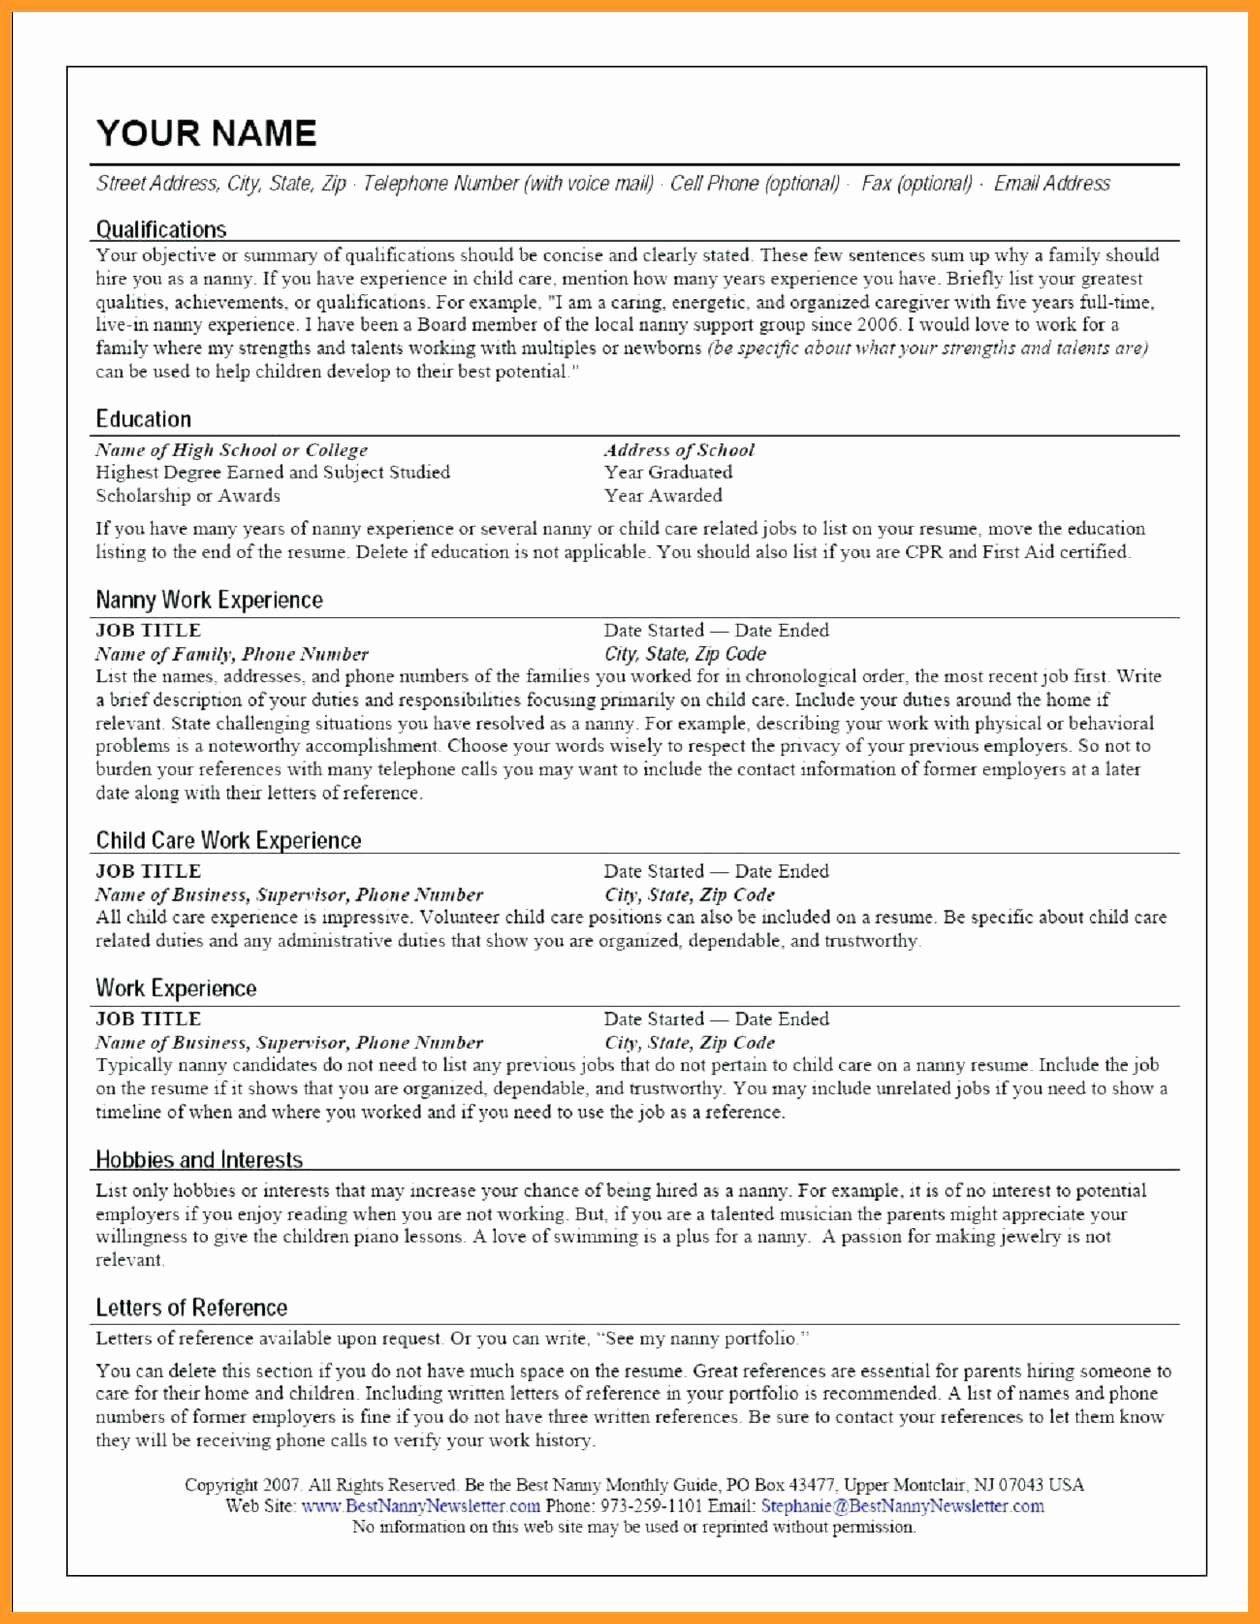 Babysitter Job Description Resume Fresh 9 10 Child Care Duties For Resume Babysitter Jobs Job Resume Examples Lifeguard Job Description